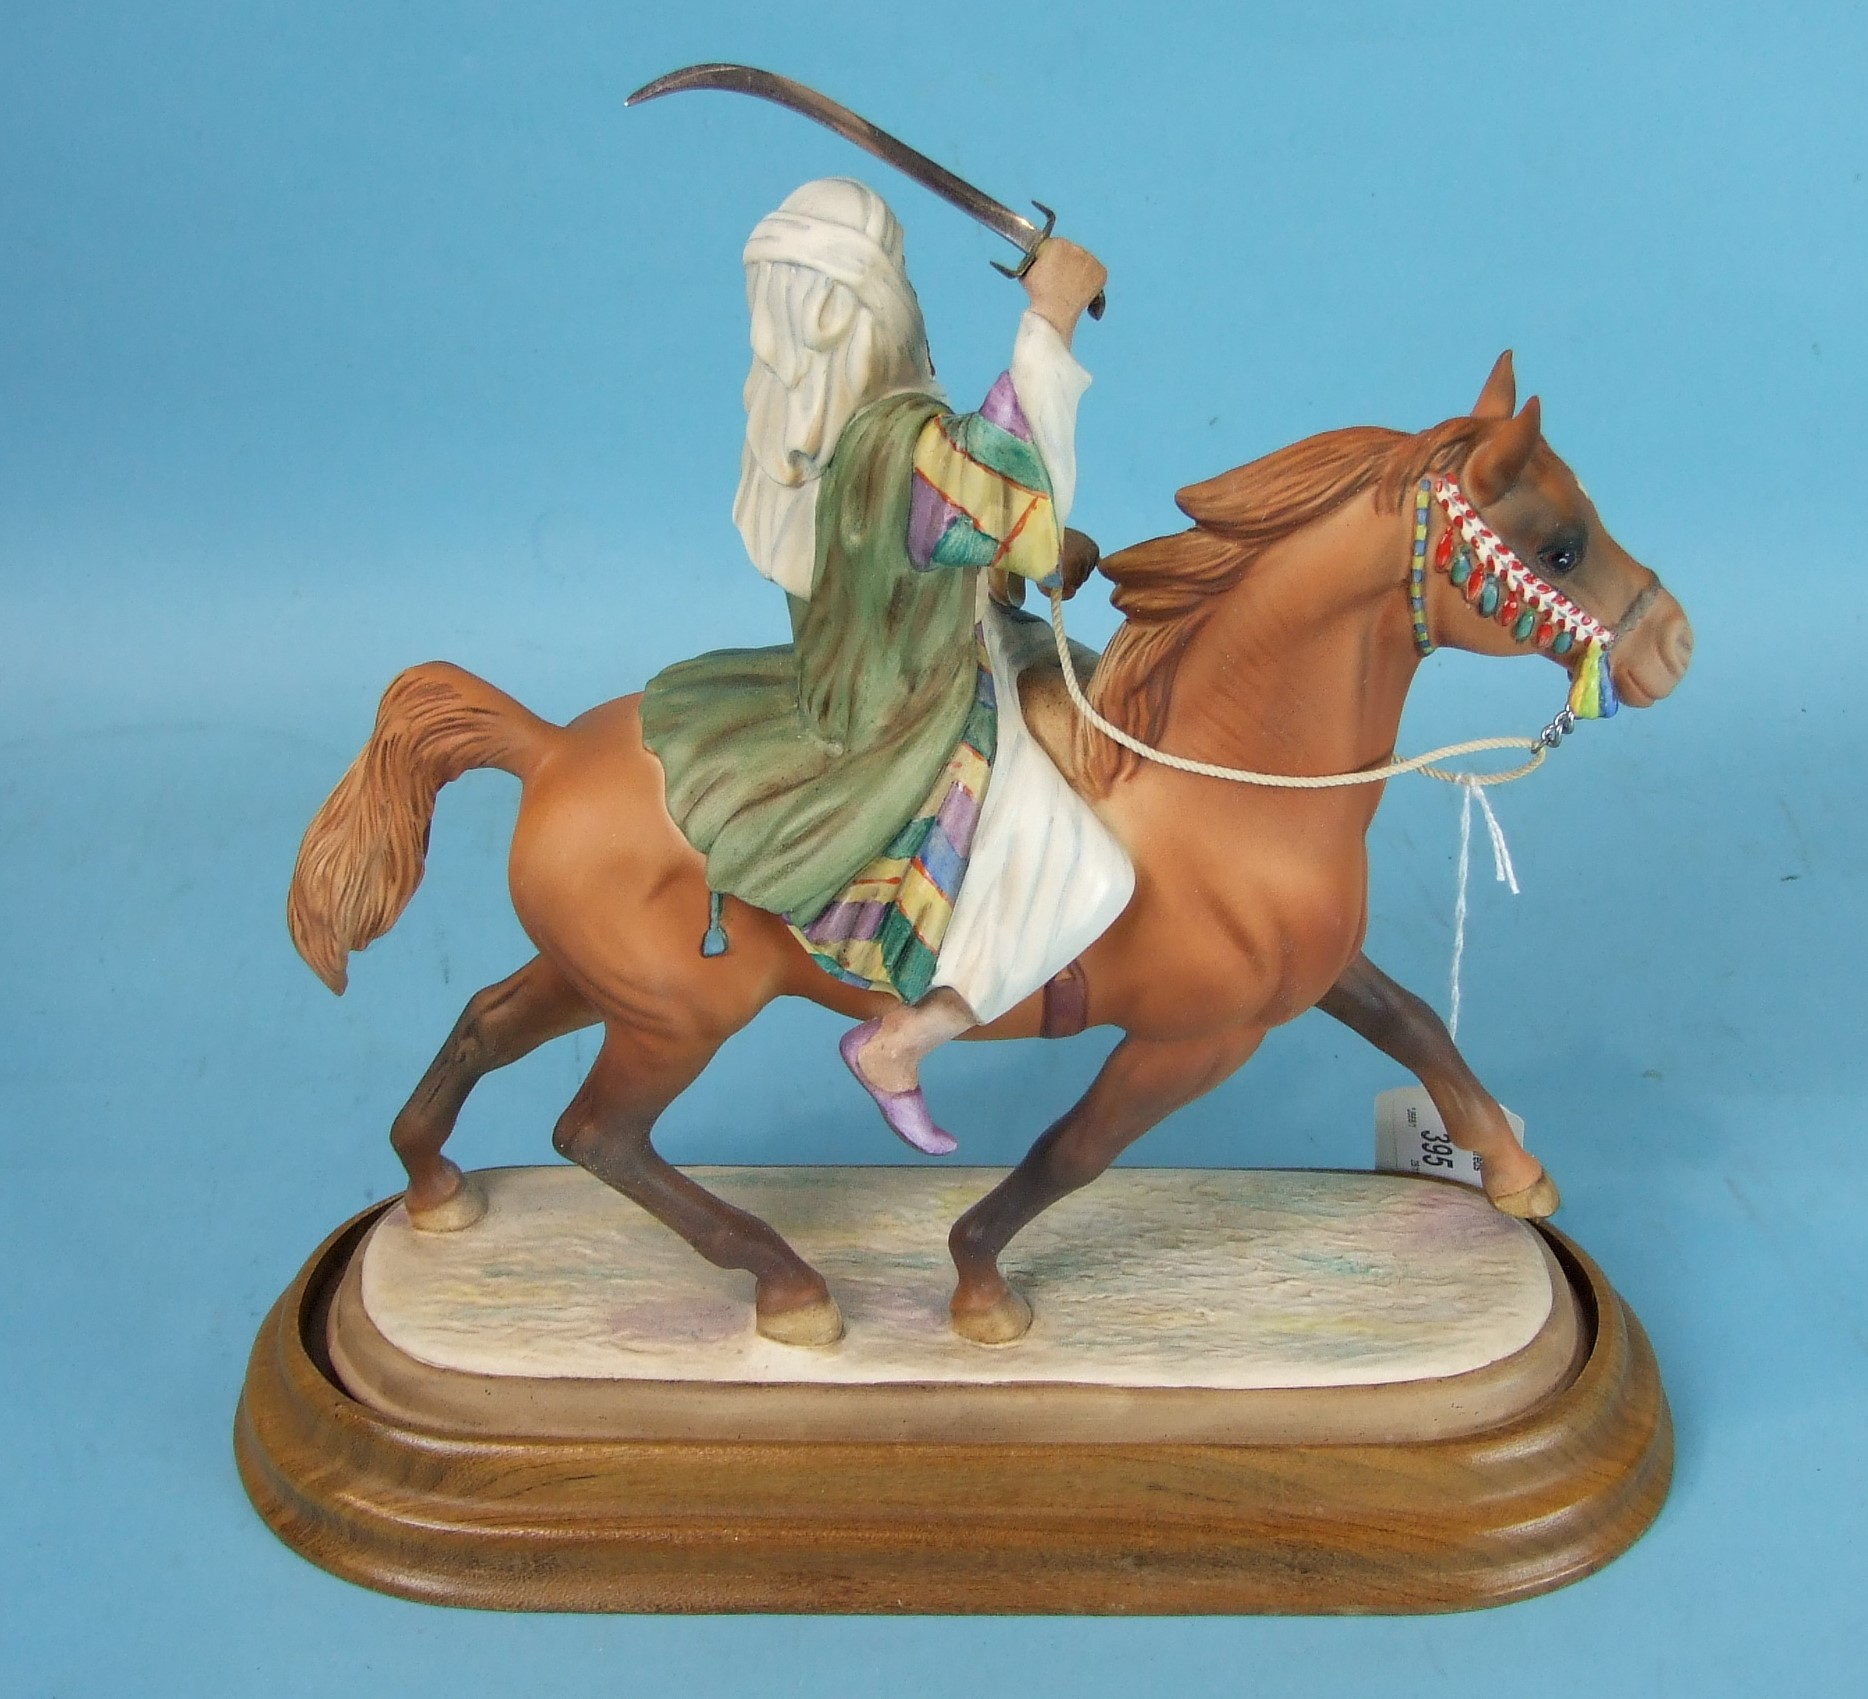 Lot 395 - A Beswick figure of a Bedouin Arab Warrior on horseback, impressed 2275 to base, 27cm high, raised